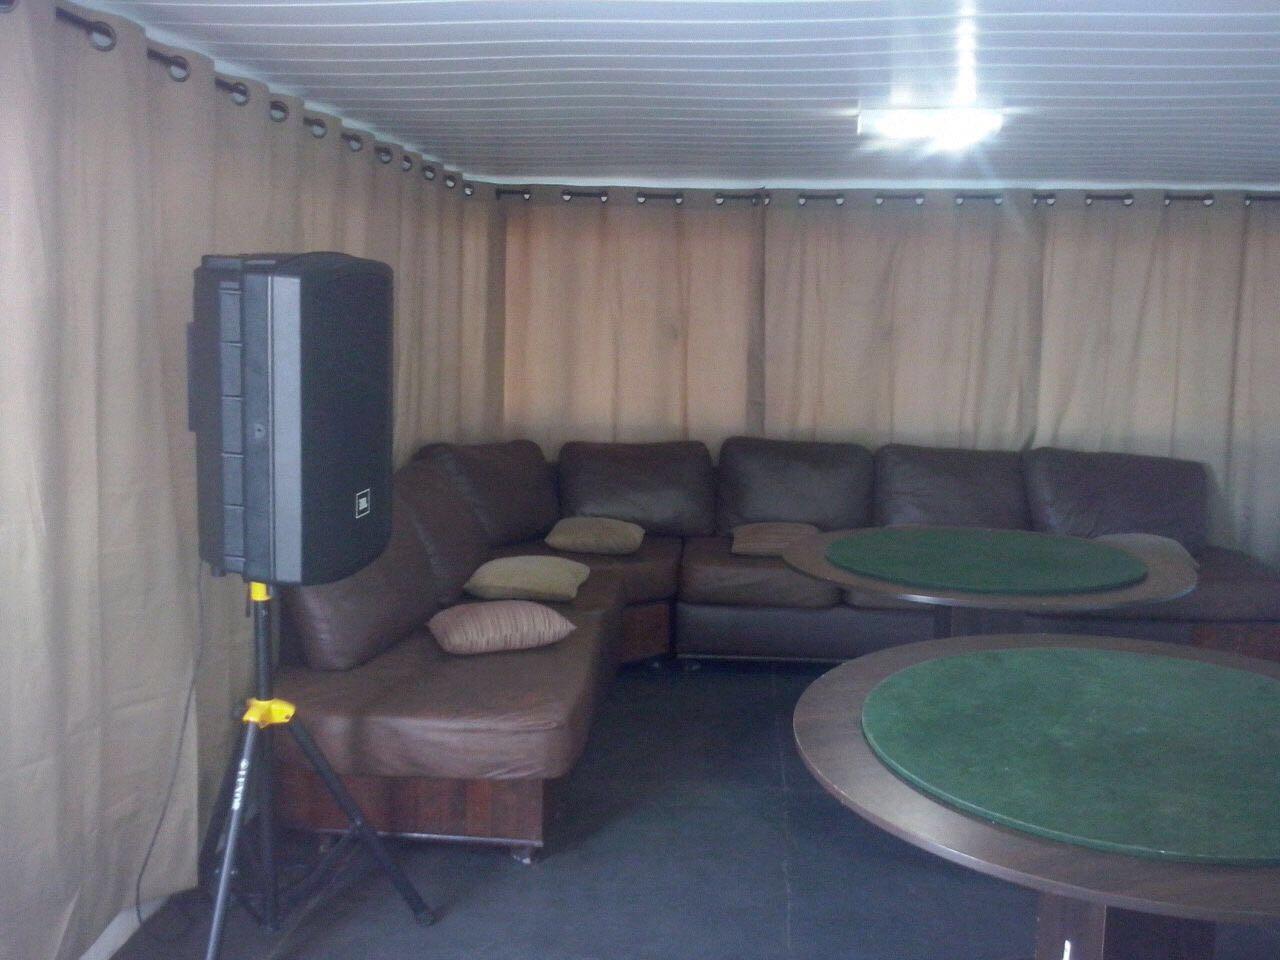 Sala De Jogos E Tv Barco Hotel San Gabriel -> Sala De Tv E Jogos